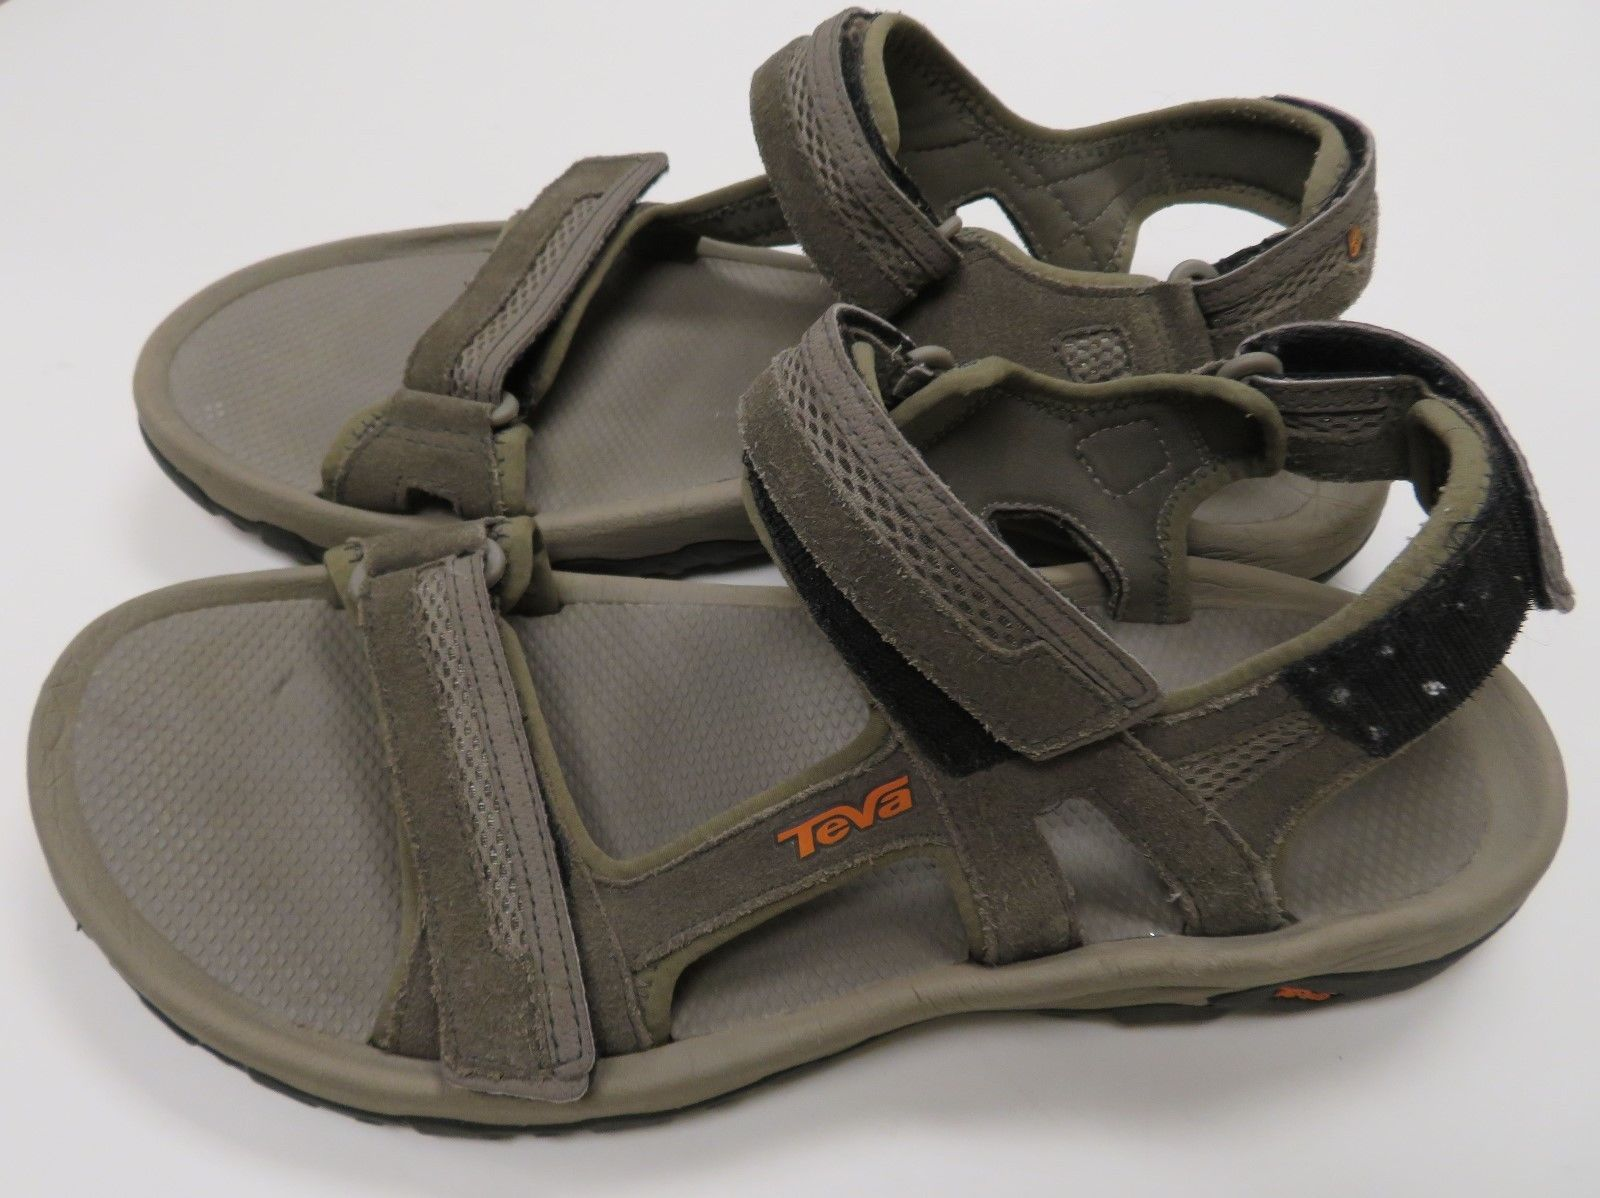 576bbda2b4a2f TEVA Hudson Mens Hiking Walking Water Sandals 1002433 Adjustable Shoes SZ 12